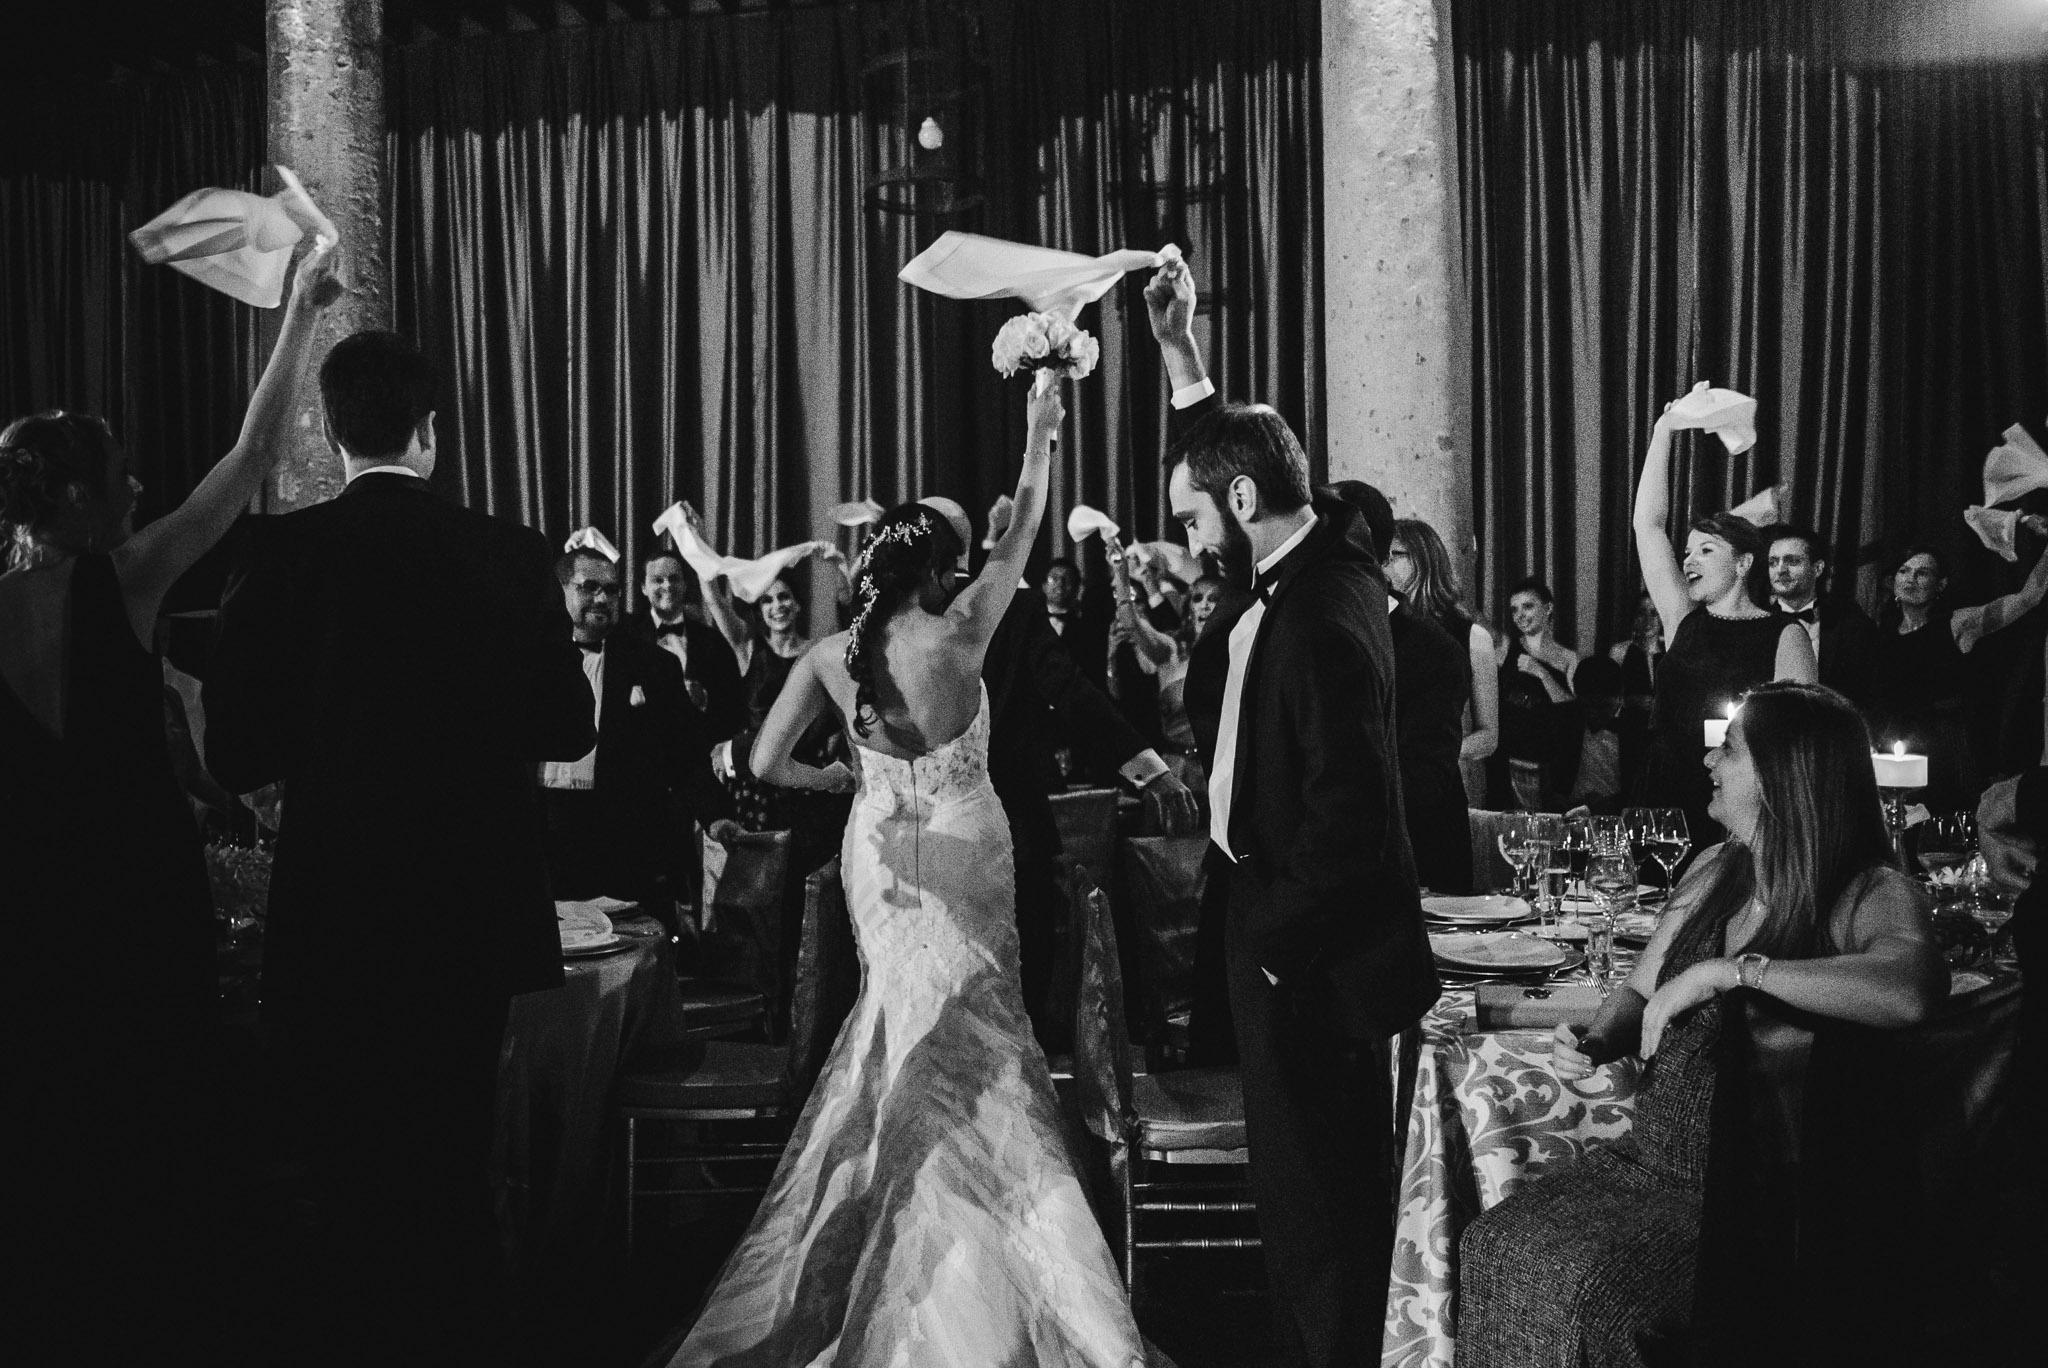 ©www.mauriziosolisbroca.com-20161001maurizio-solis-broca-mexico-canada-wedding-photographer20161001DSC08117-Edit.jpg